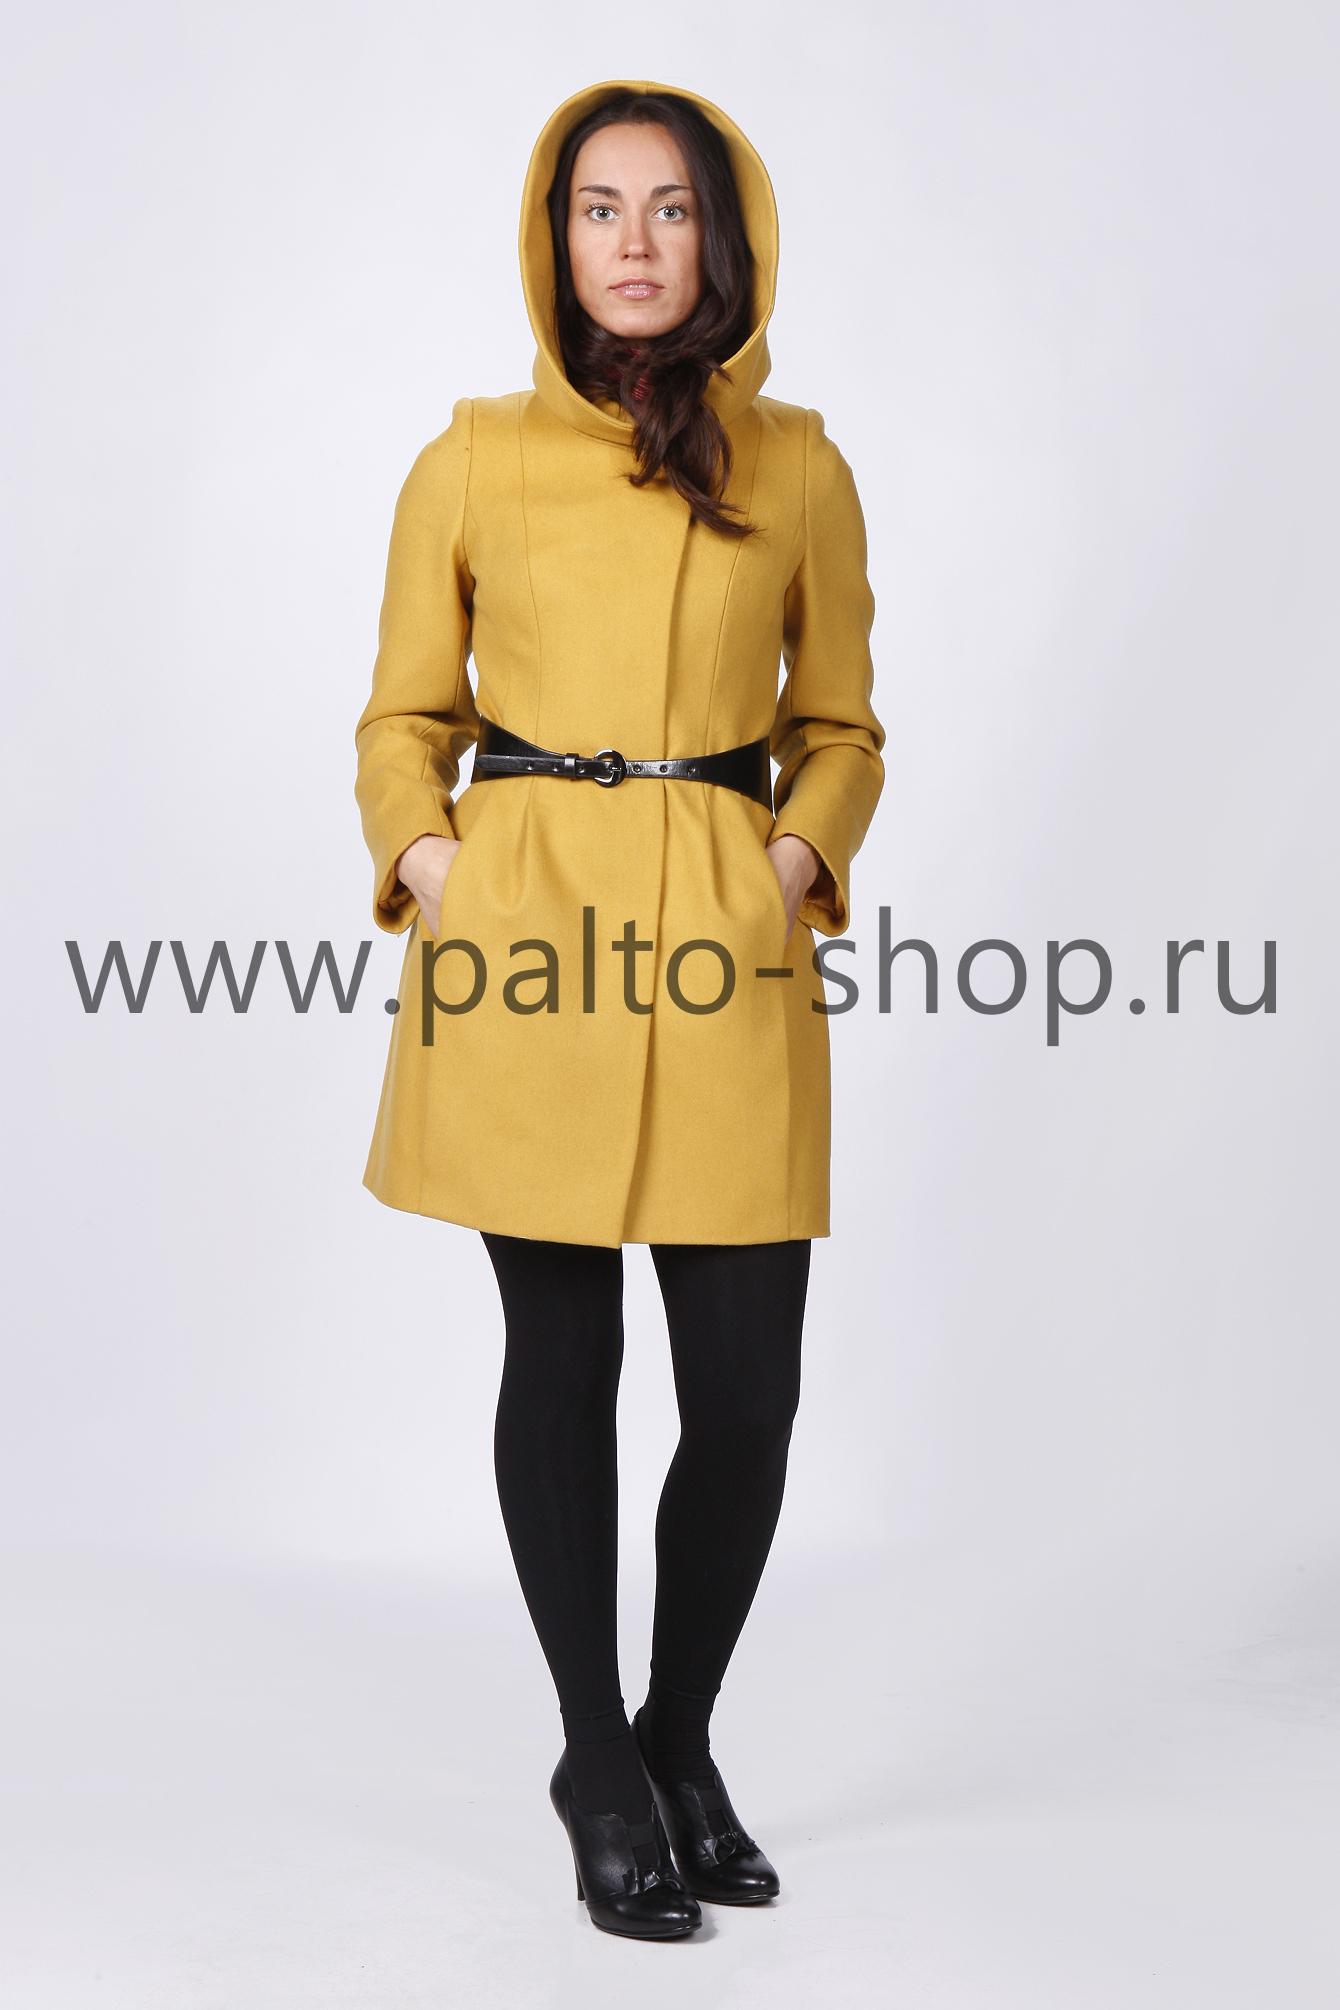 22e6dd37676 Интернет магазин Palto-Shop.ru Palto-Shop.ru https   palto-shop.ru ...